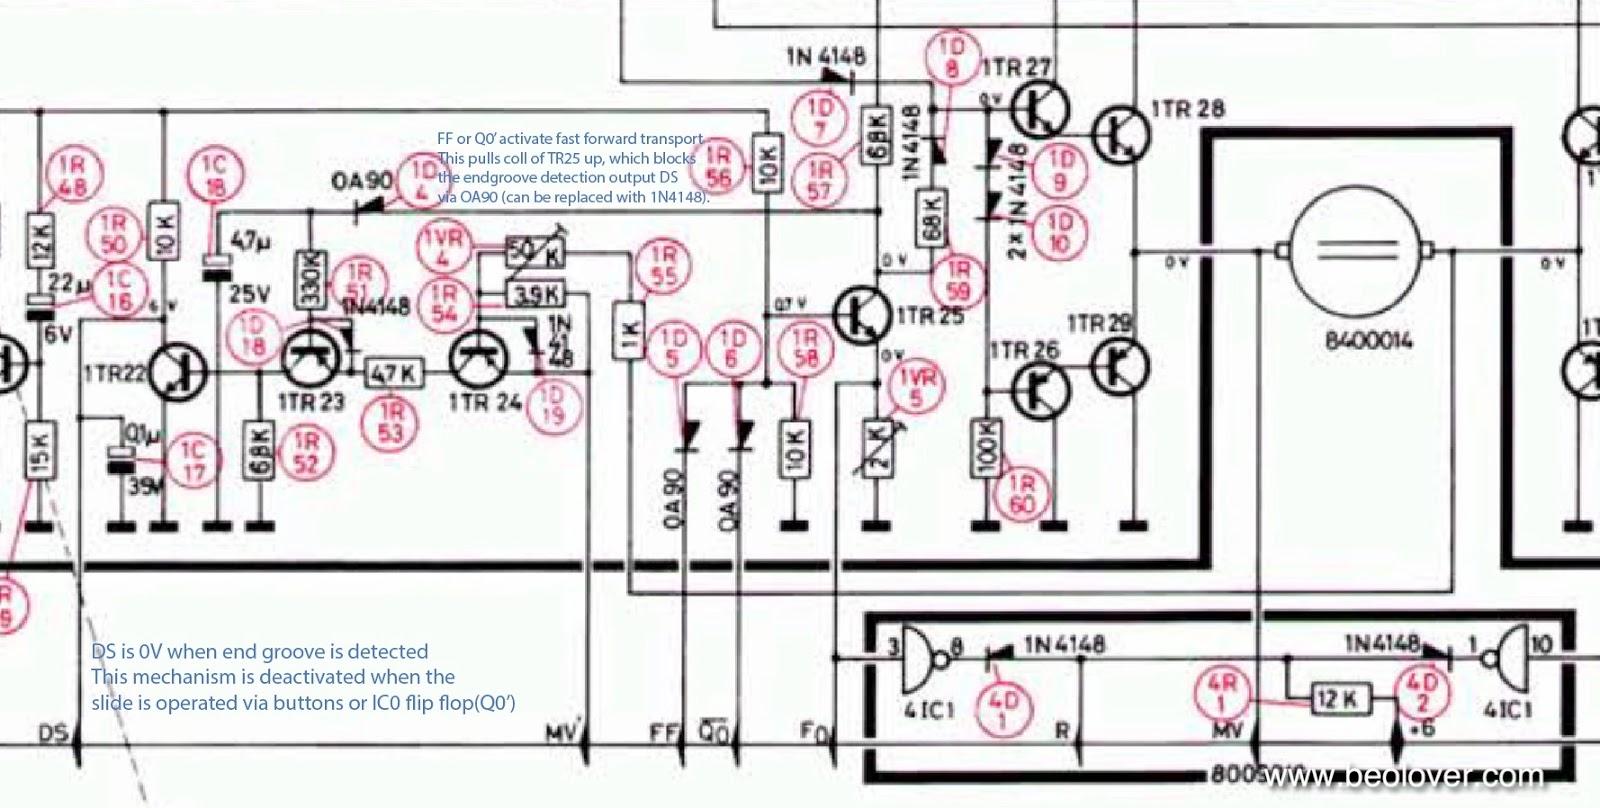 dremel saw- beor: beogram 4000: end groove detection issue on dremel  3000 parts diagram, dremel